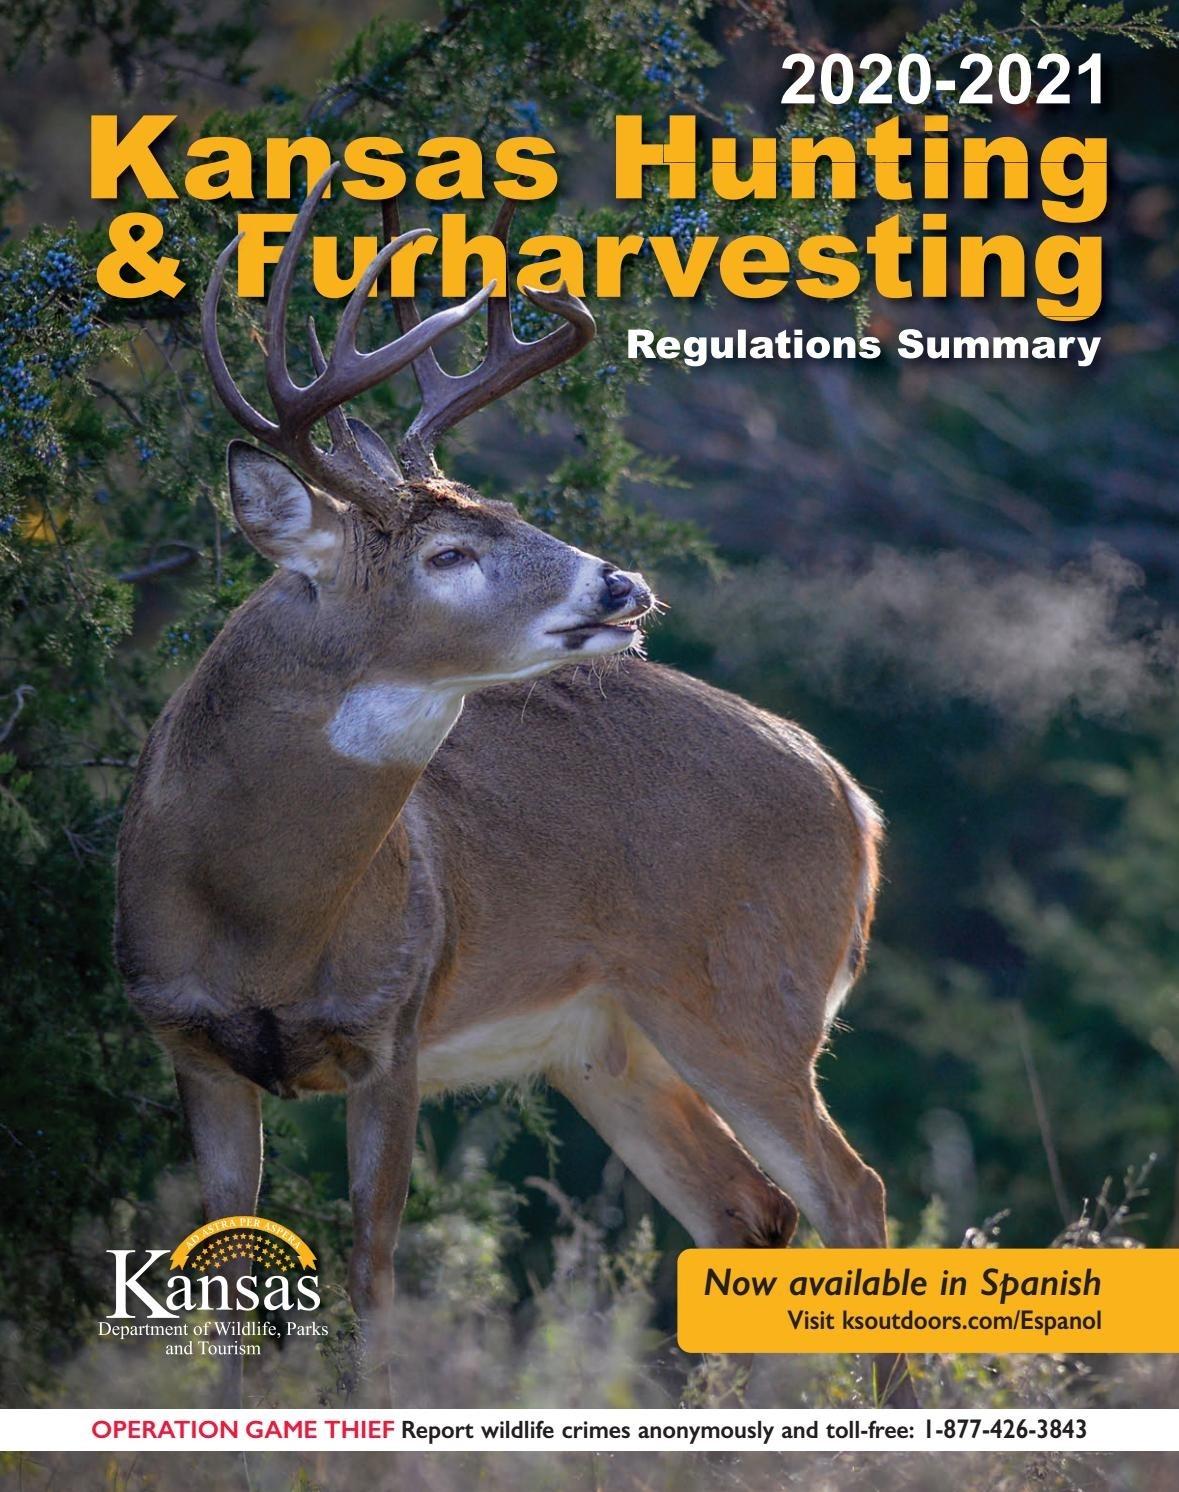 2020-2021 Kansas Hunting & Furharvesting Regulations Summary  Third Rut Missouri 2021